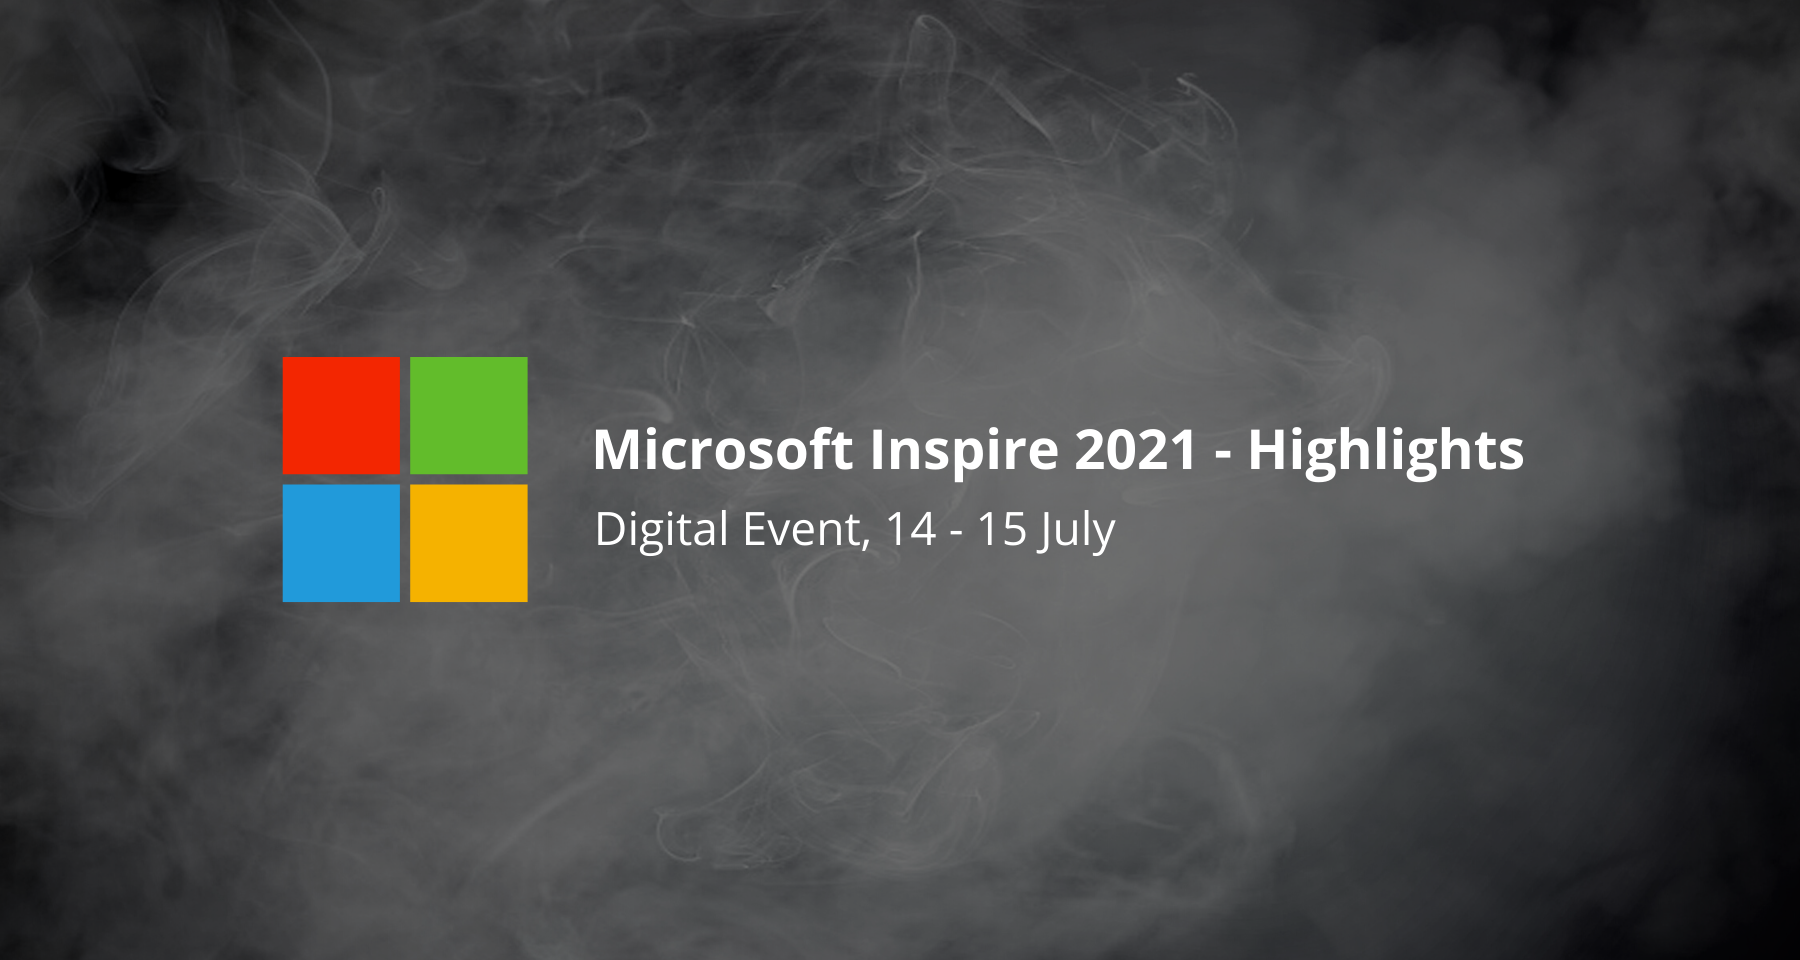 Microsoft Inspire Event